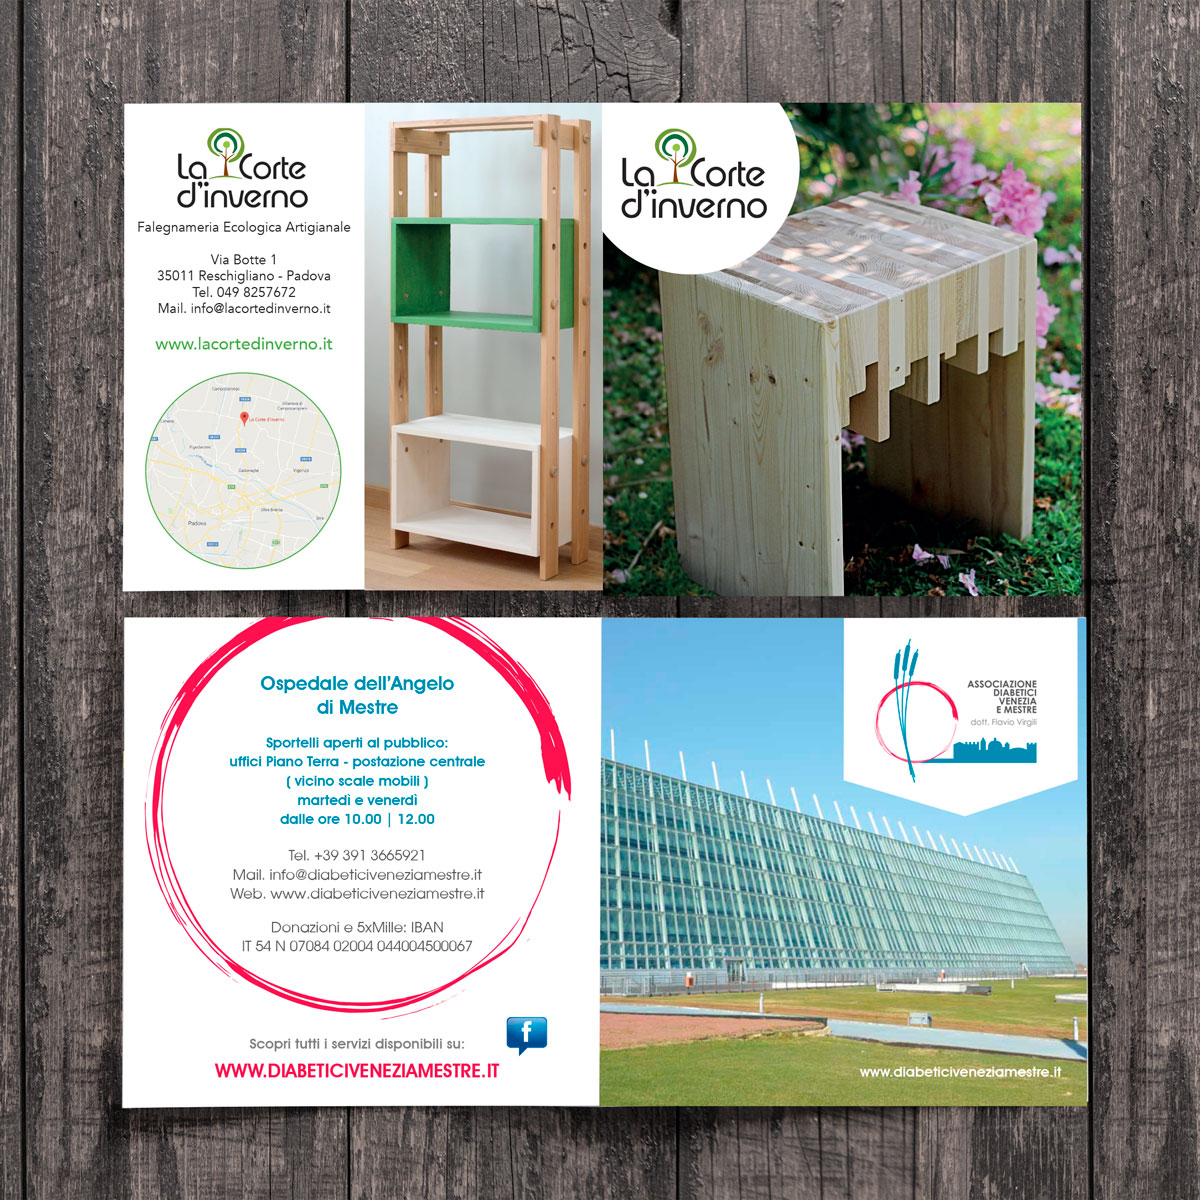 brochure_corte_dinverno_associazione_diabetici